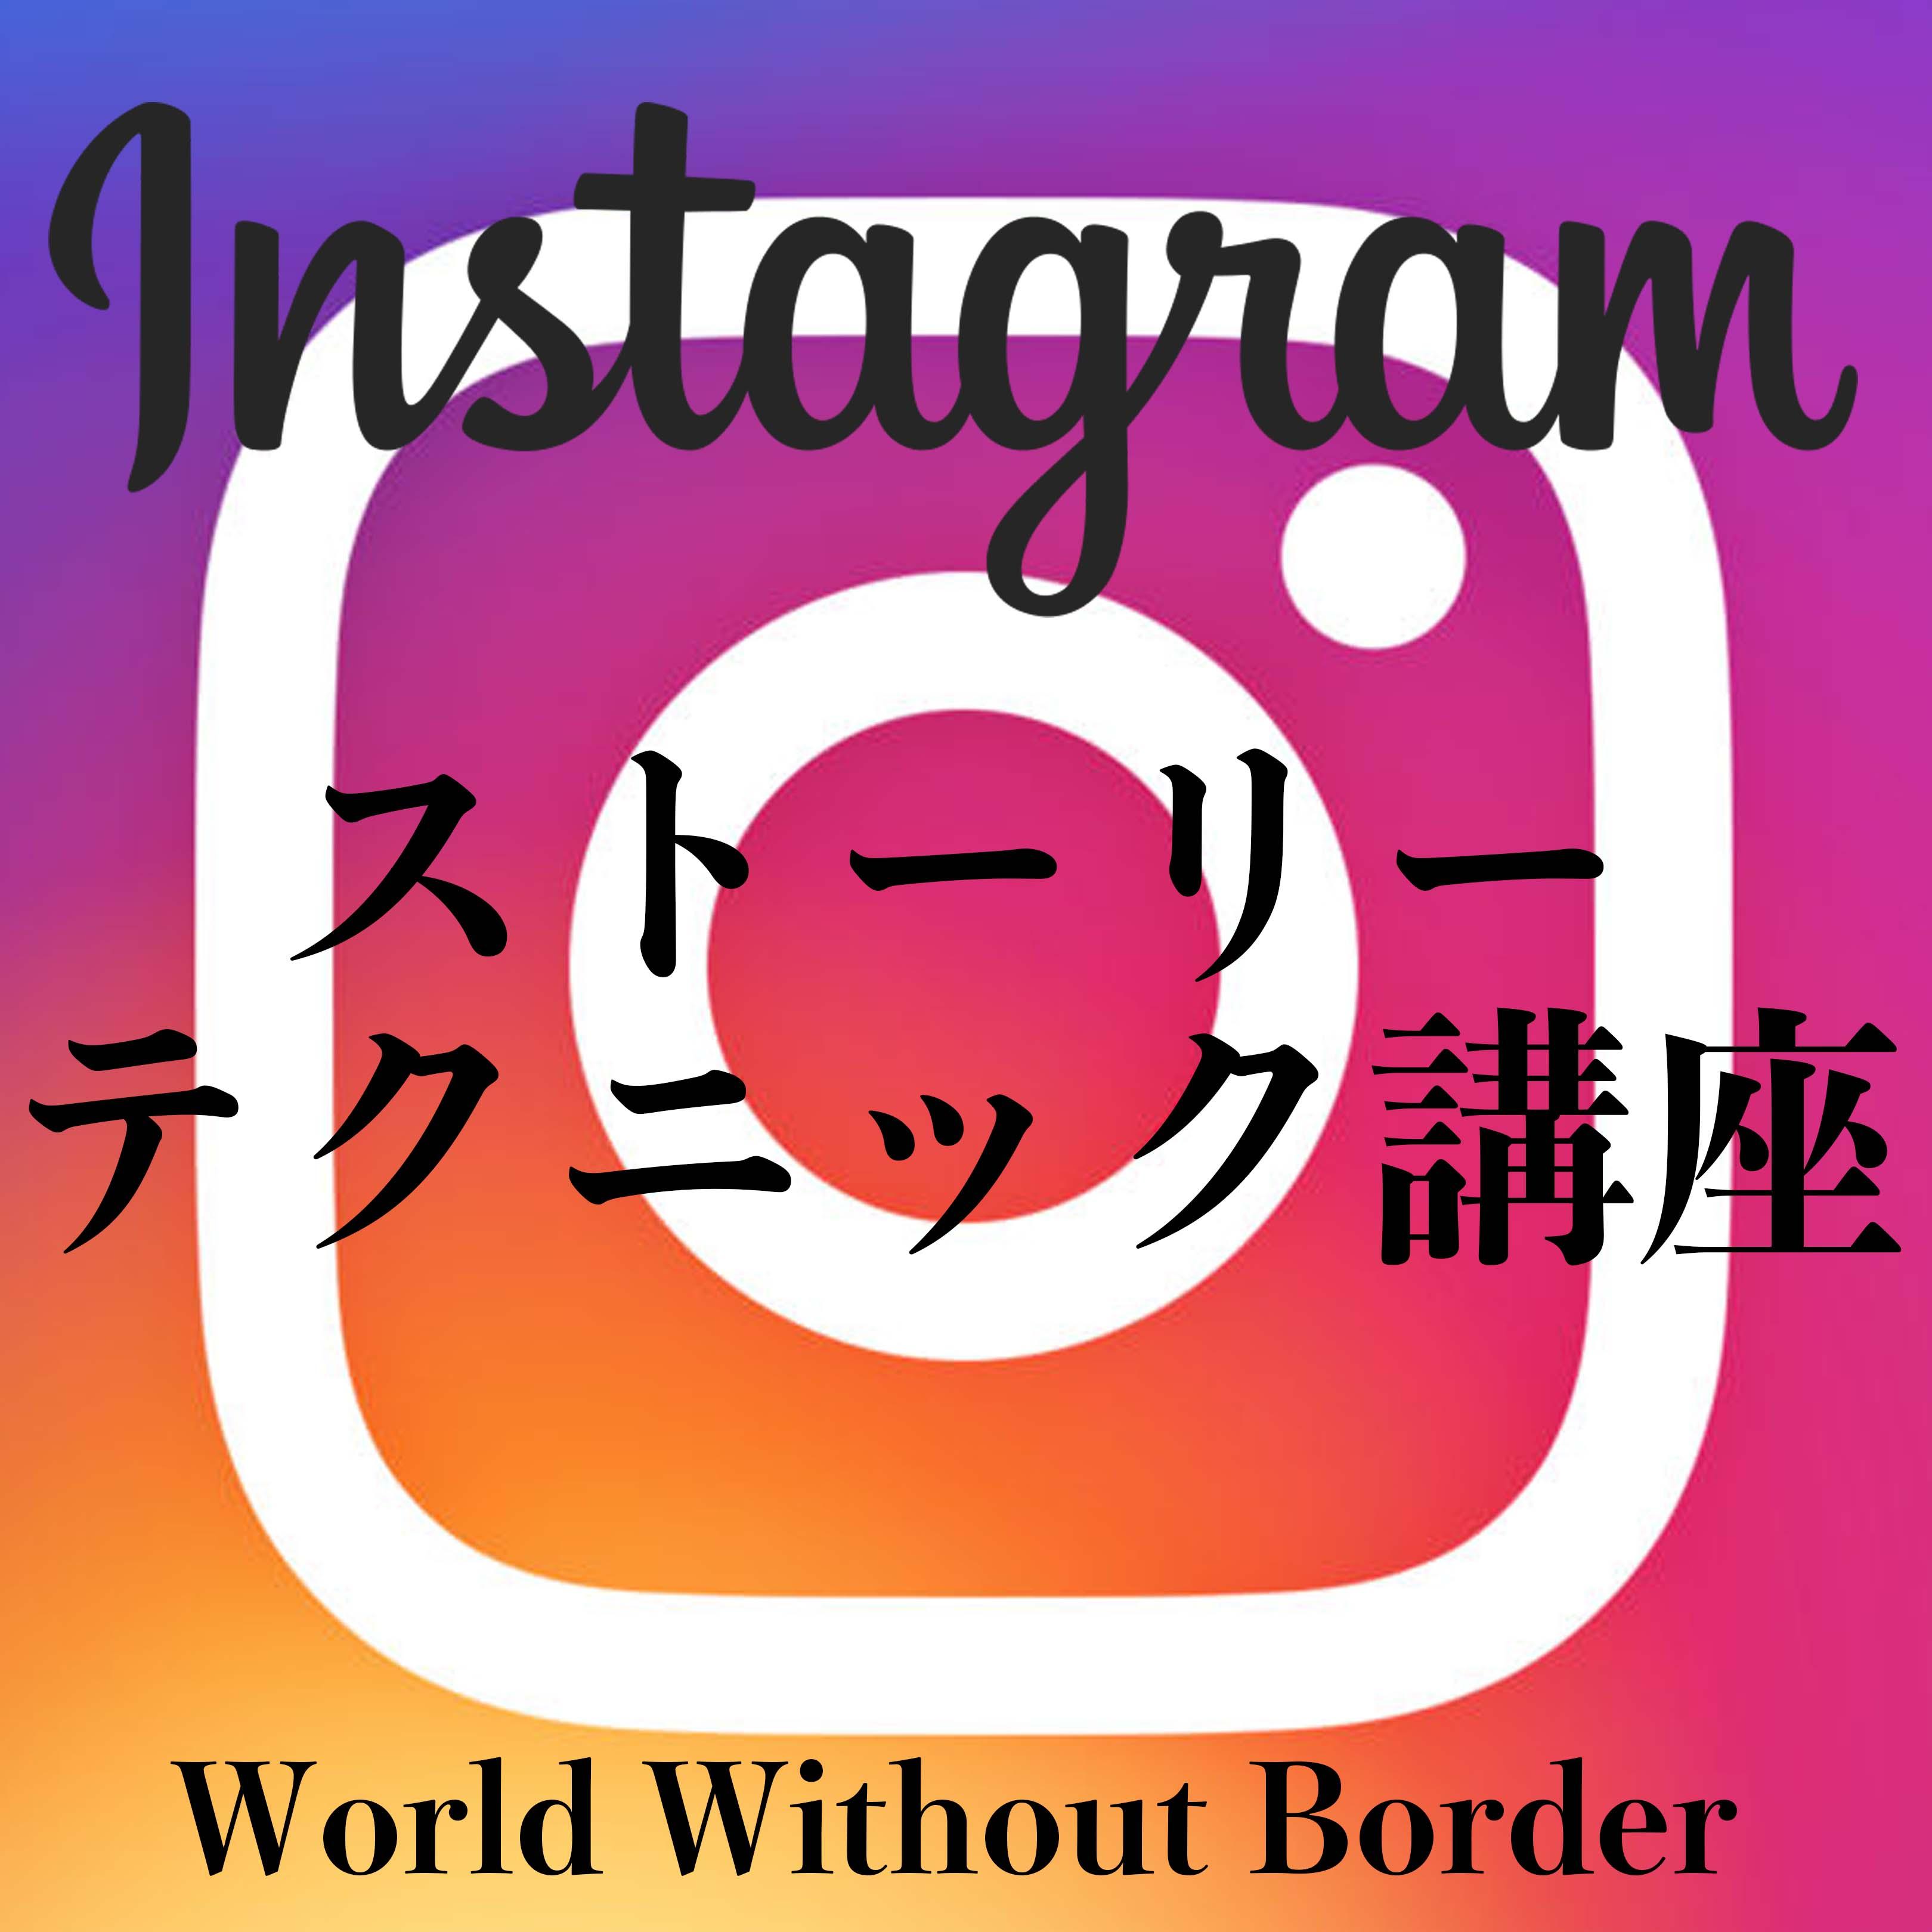 【Instagram】閲覧者10倍?! インスタストーリーテクニック「文字・位置情報編」